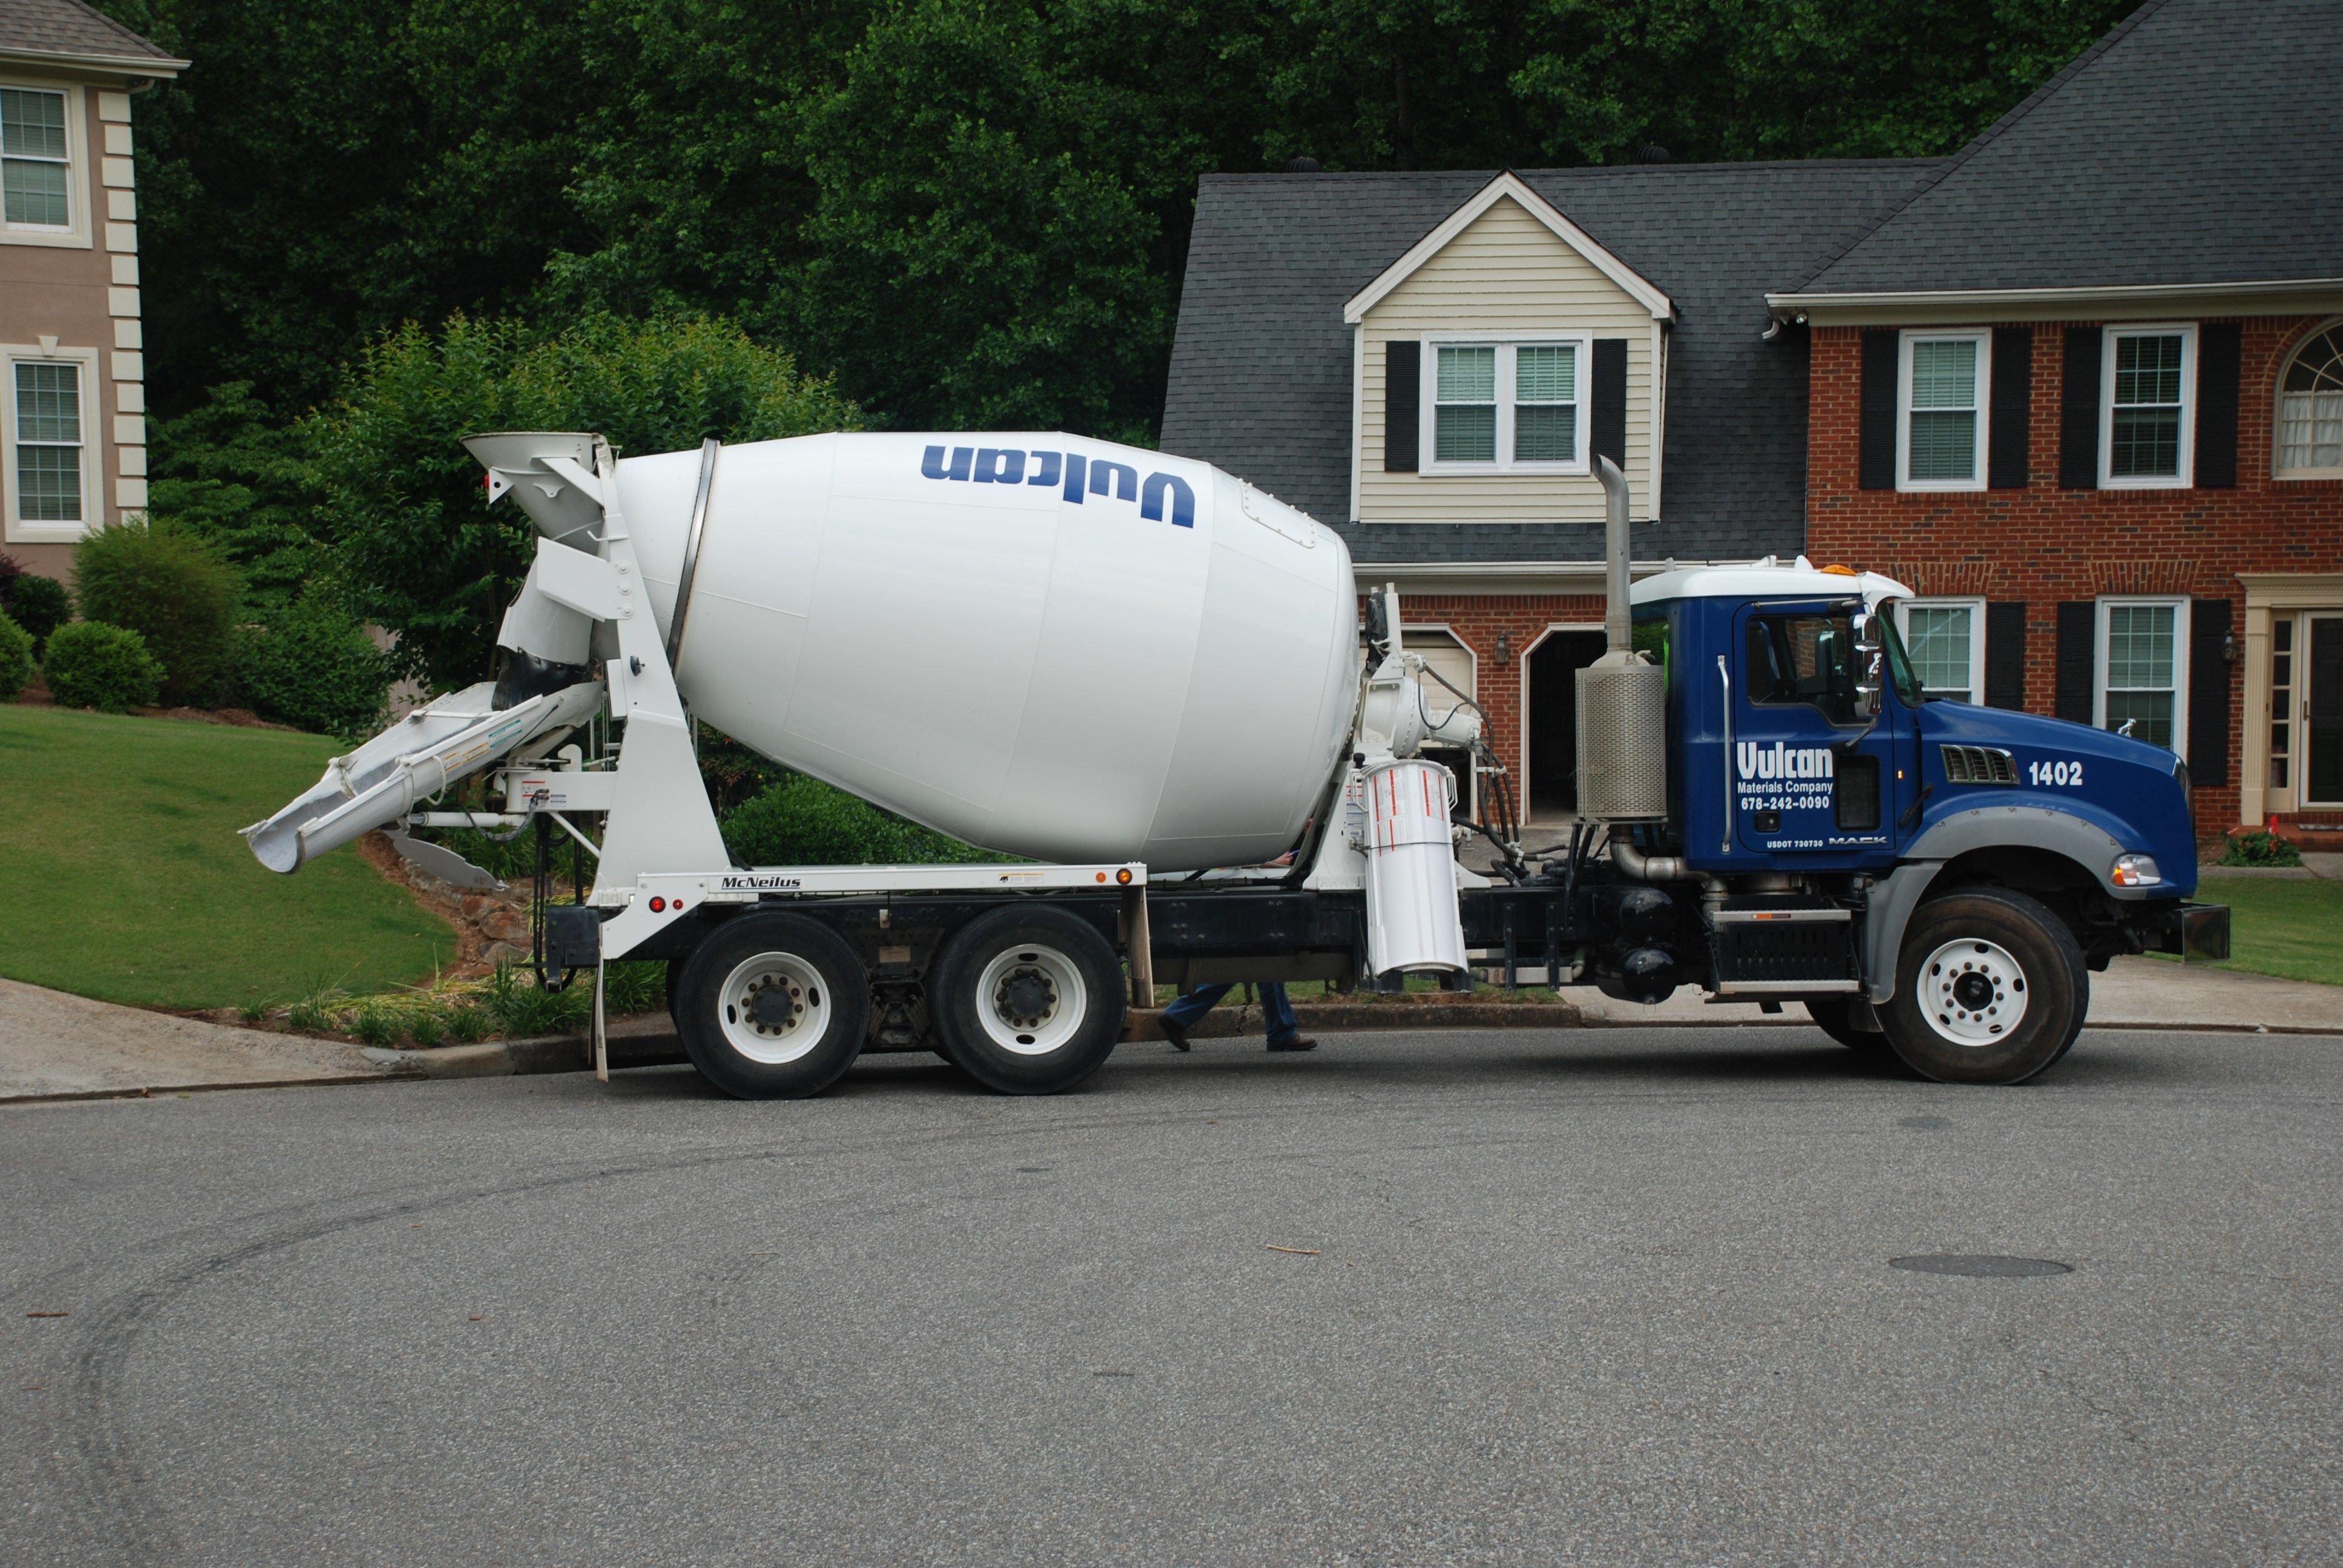 How to Buy Concrete: Hiring a Ready-Mix Truck | Decks.com